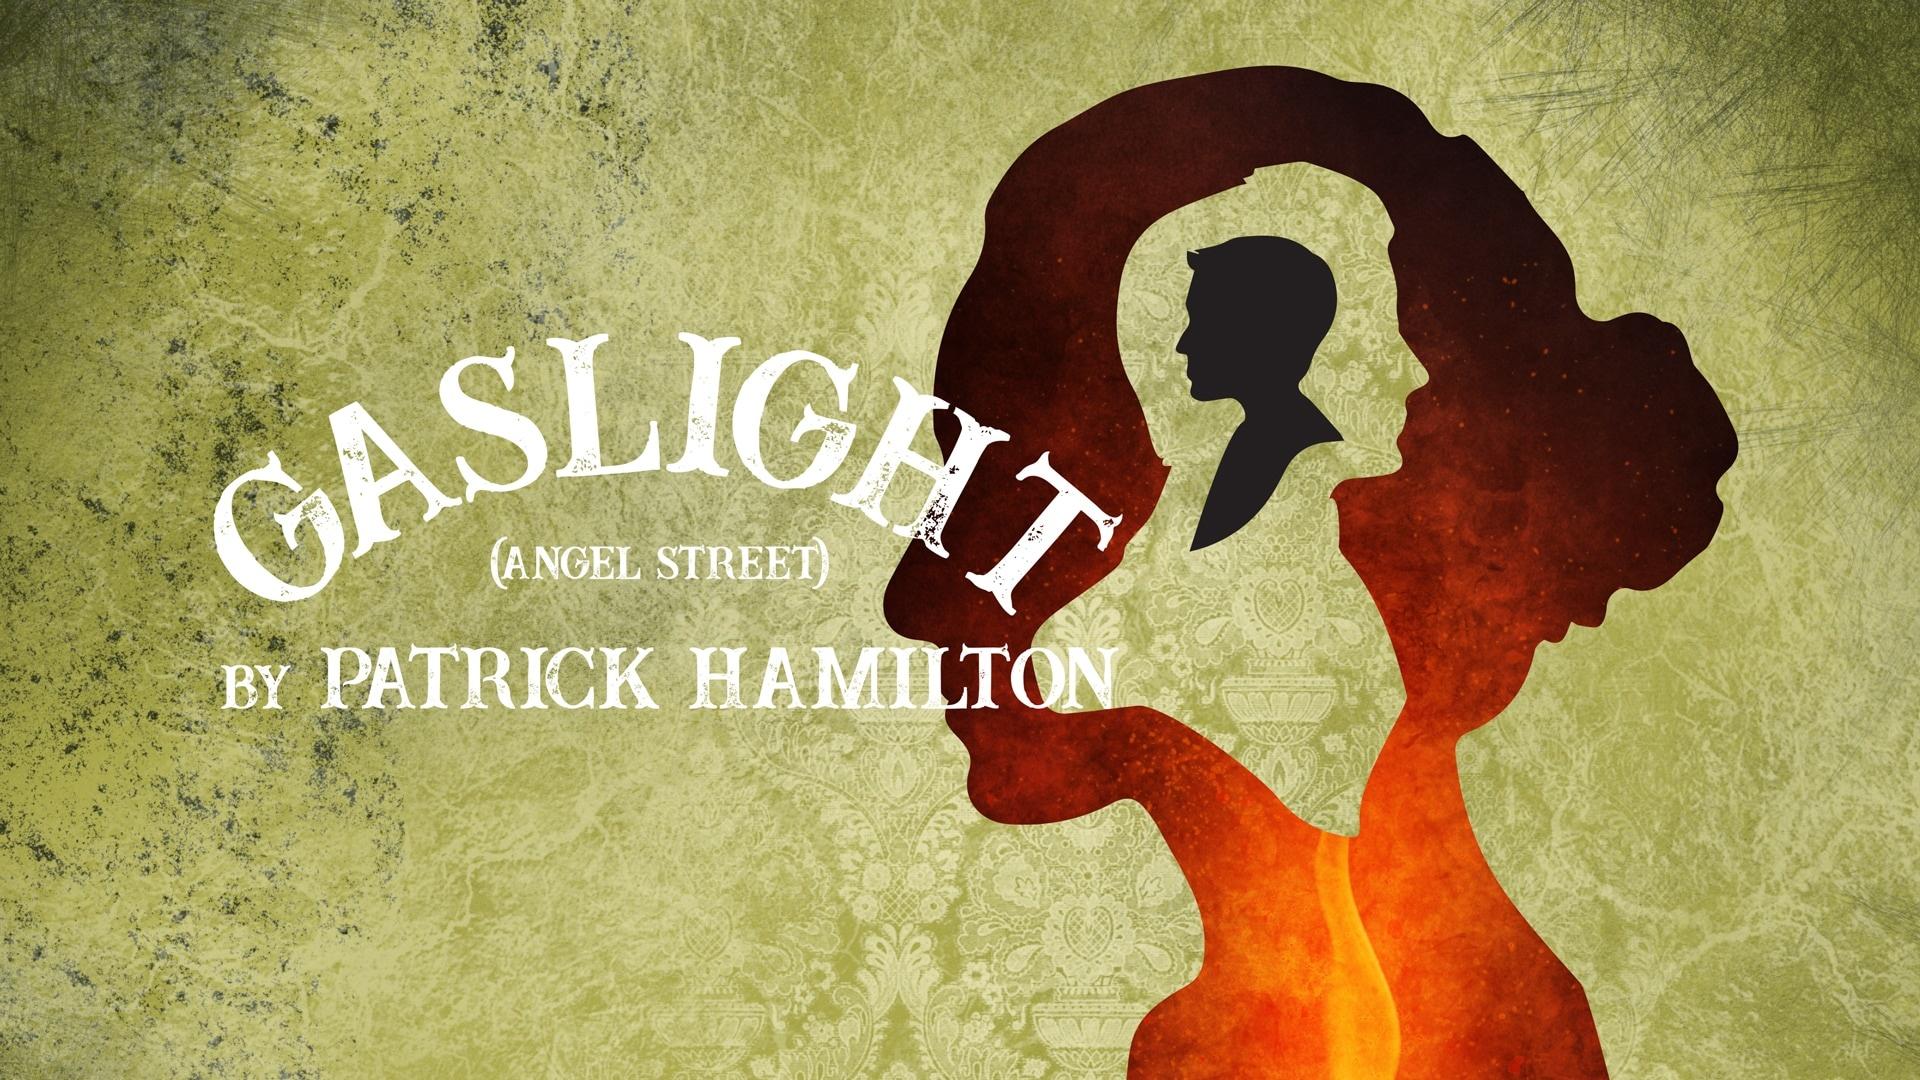 Gaslight (Angel Street) by Patrick Hamilton - show graphic